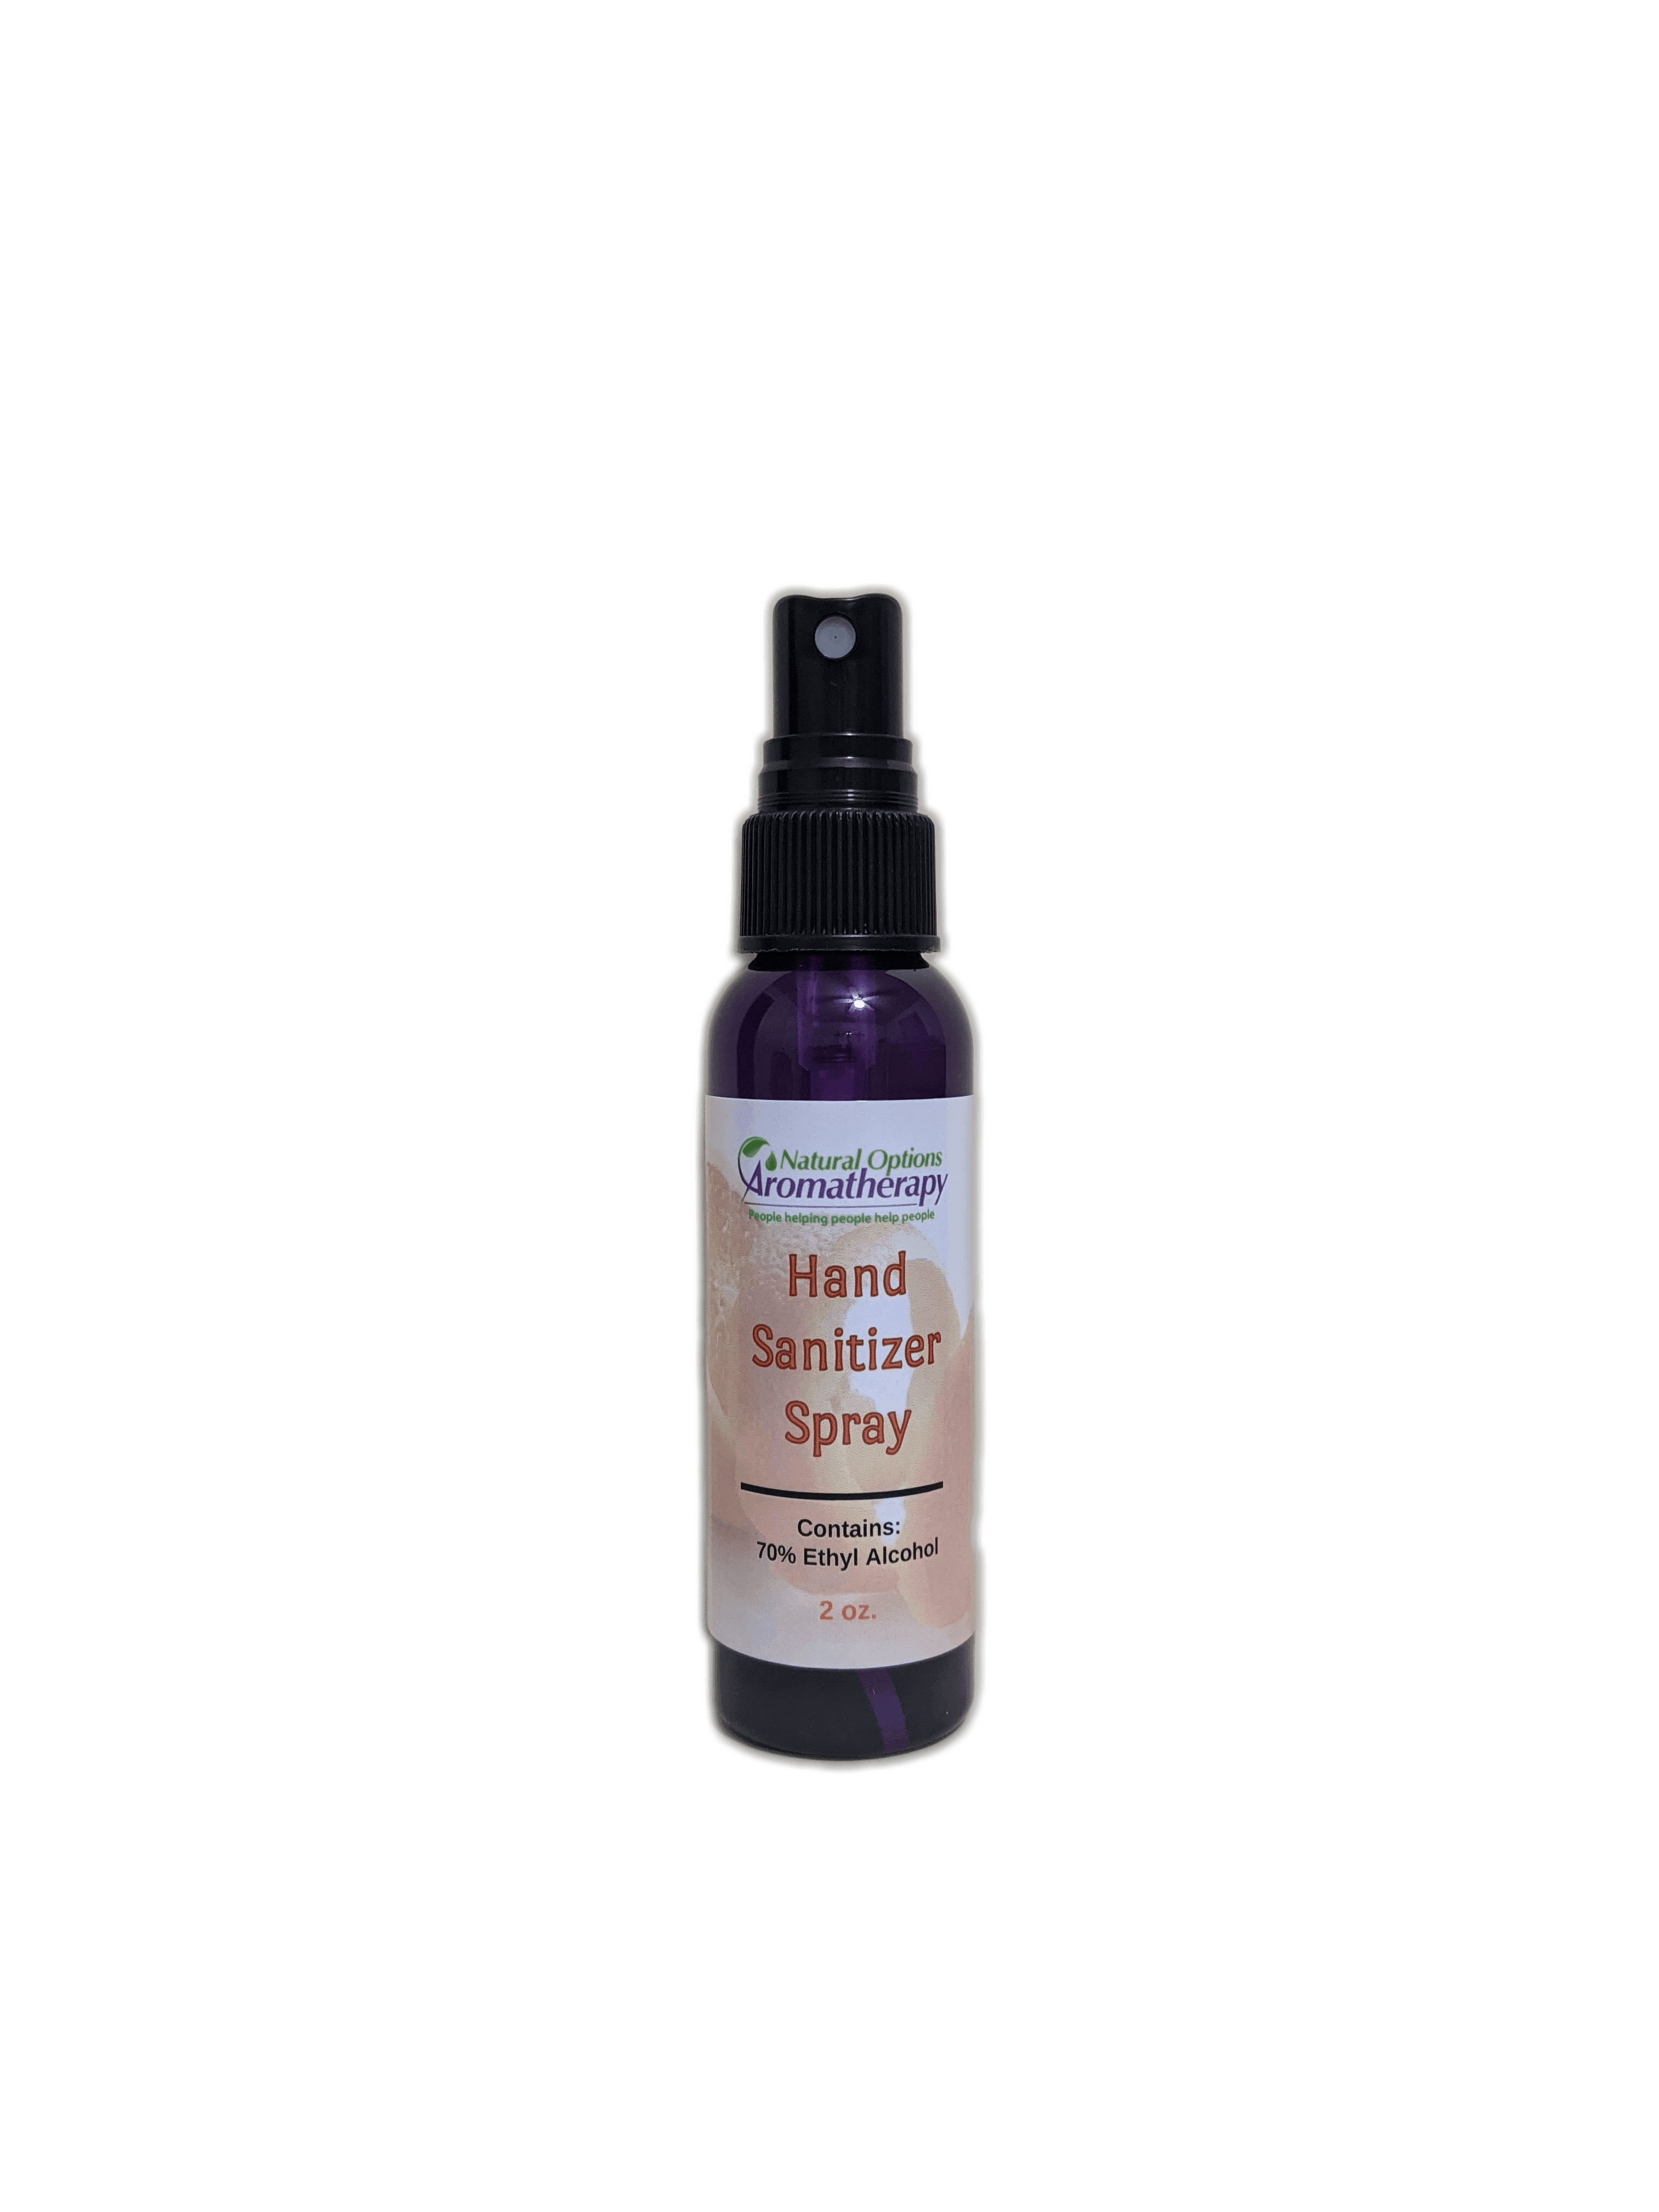 Citrus Spray Hand Sanitizer 2 oz bottle